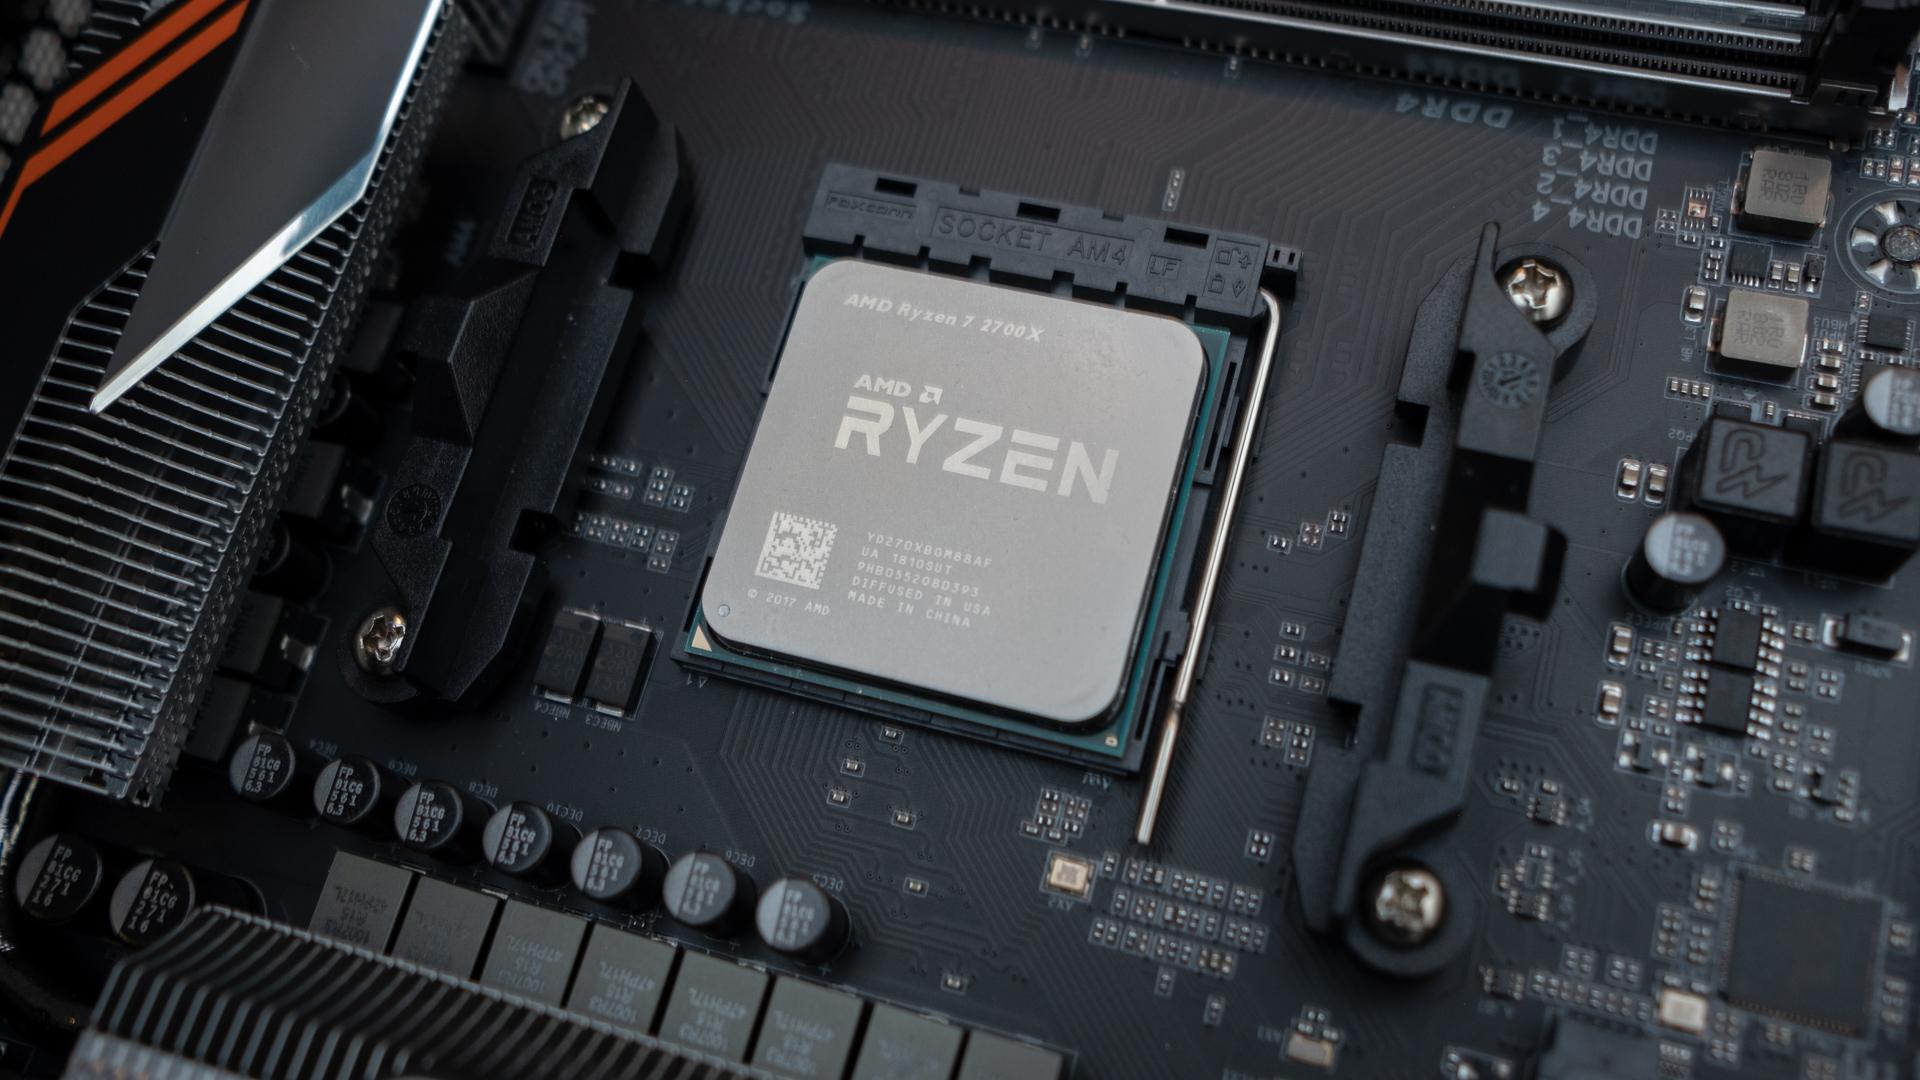 AMD Ryzen 7 2700X gets overclocked to break the 6GHz barrier | TechRadar